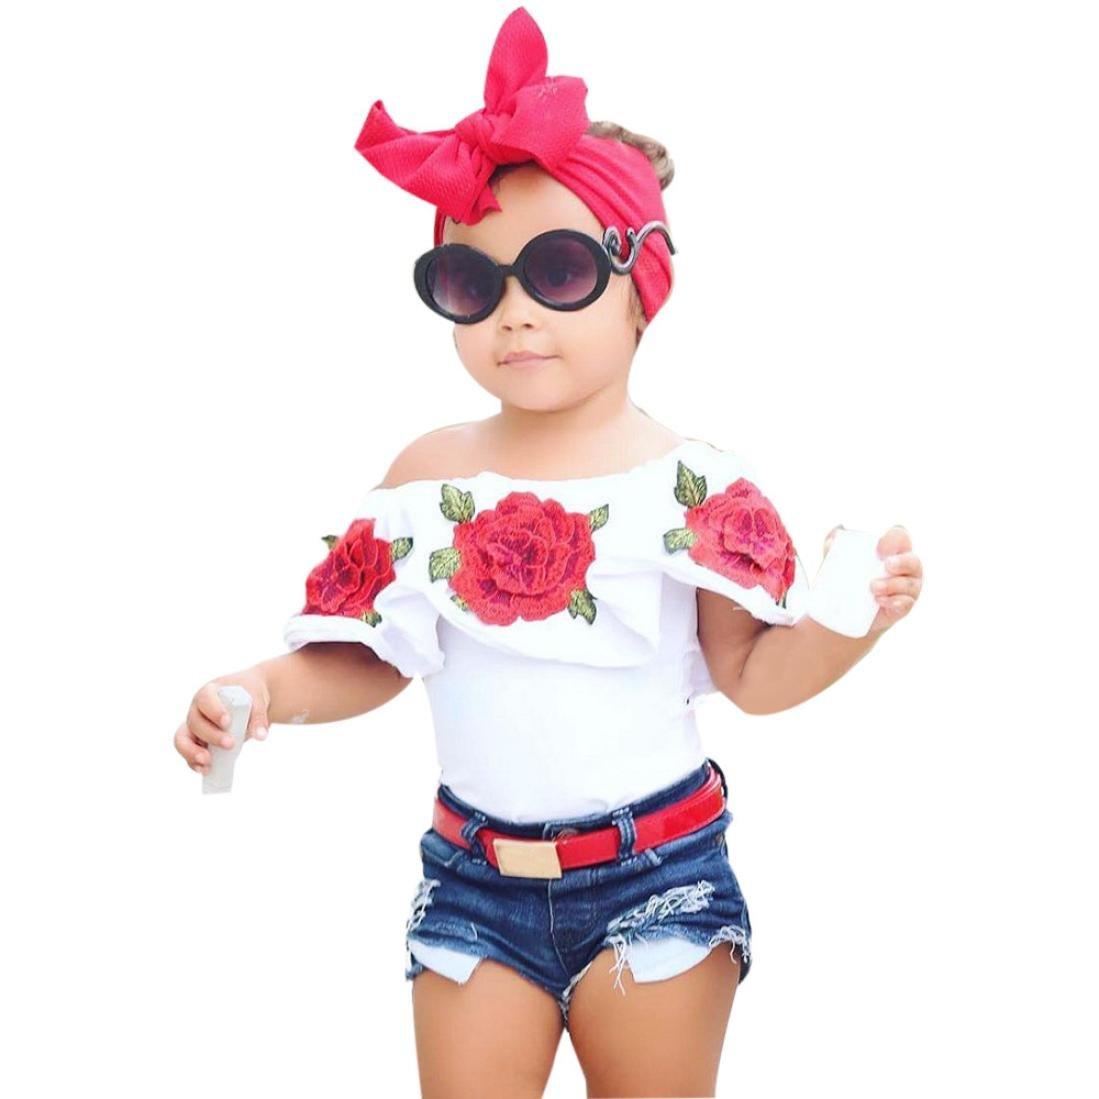 49efcdf24f25 Amazon.com  Goodlock Toddler Kids Fashion Shirt Baby Girls Off ...